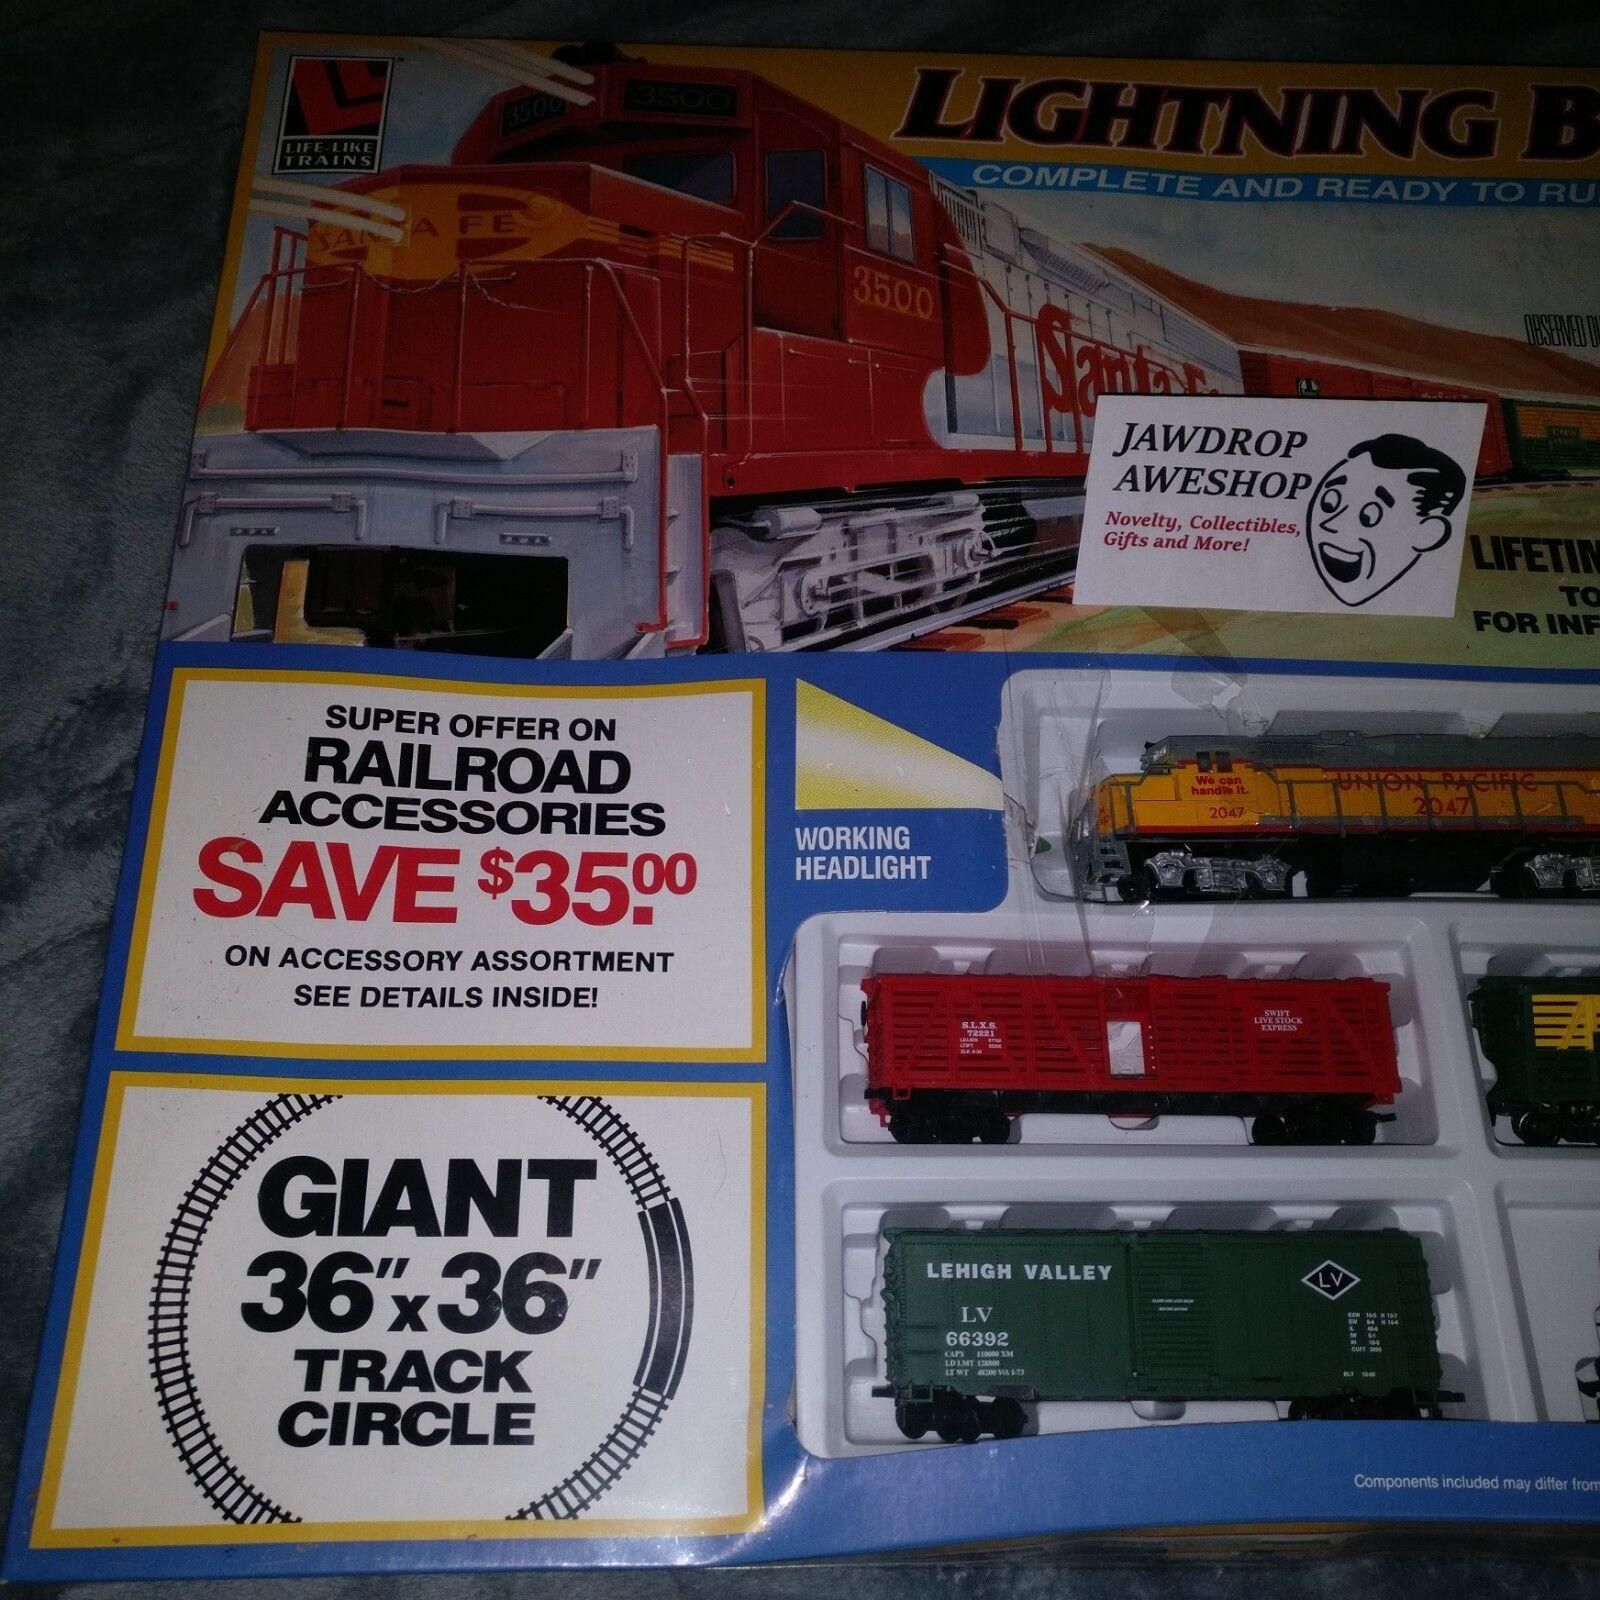 VINTAGE NEW ELECTRIC TRAIN SET HO SCALE LIGHTNING BOLT EXPRESS (SOME BOX DAMAGE)